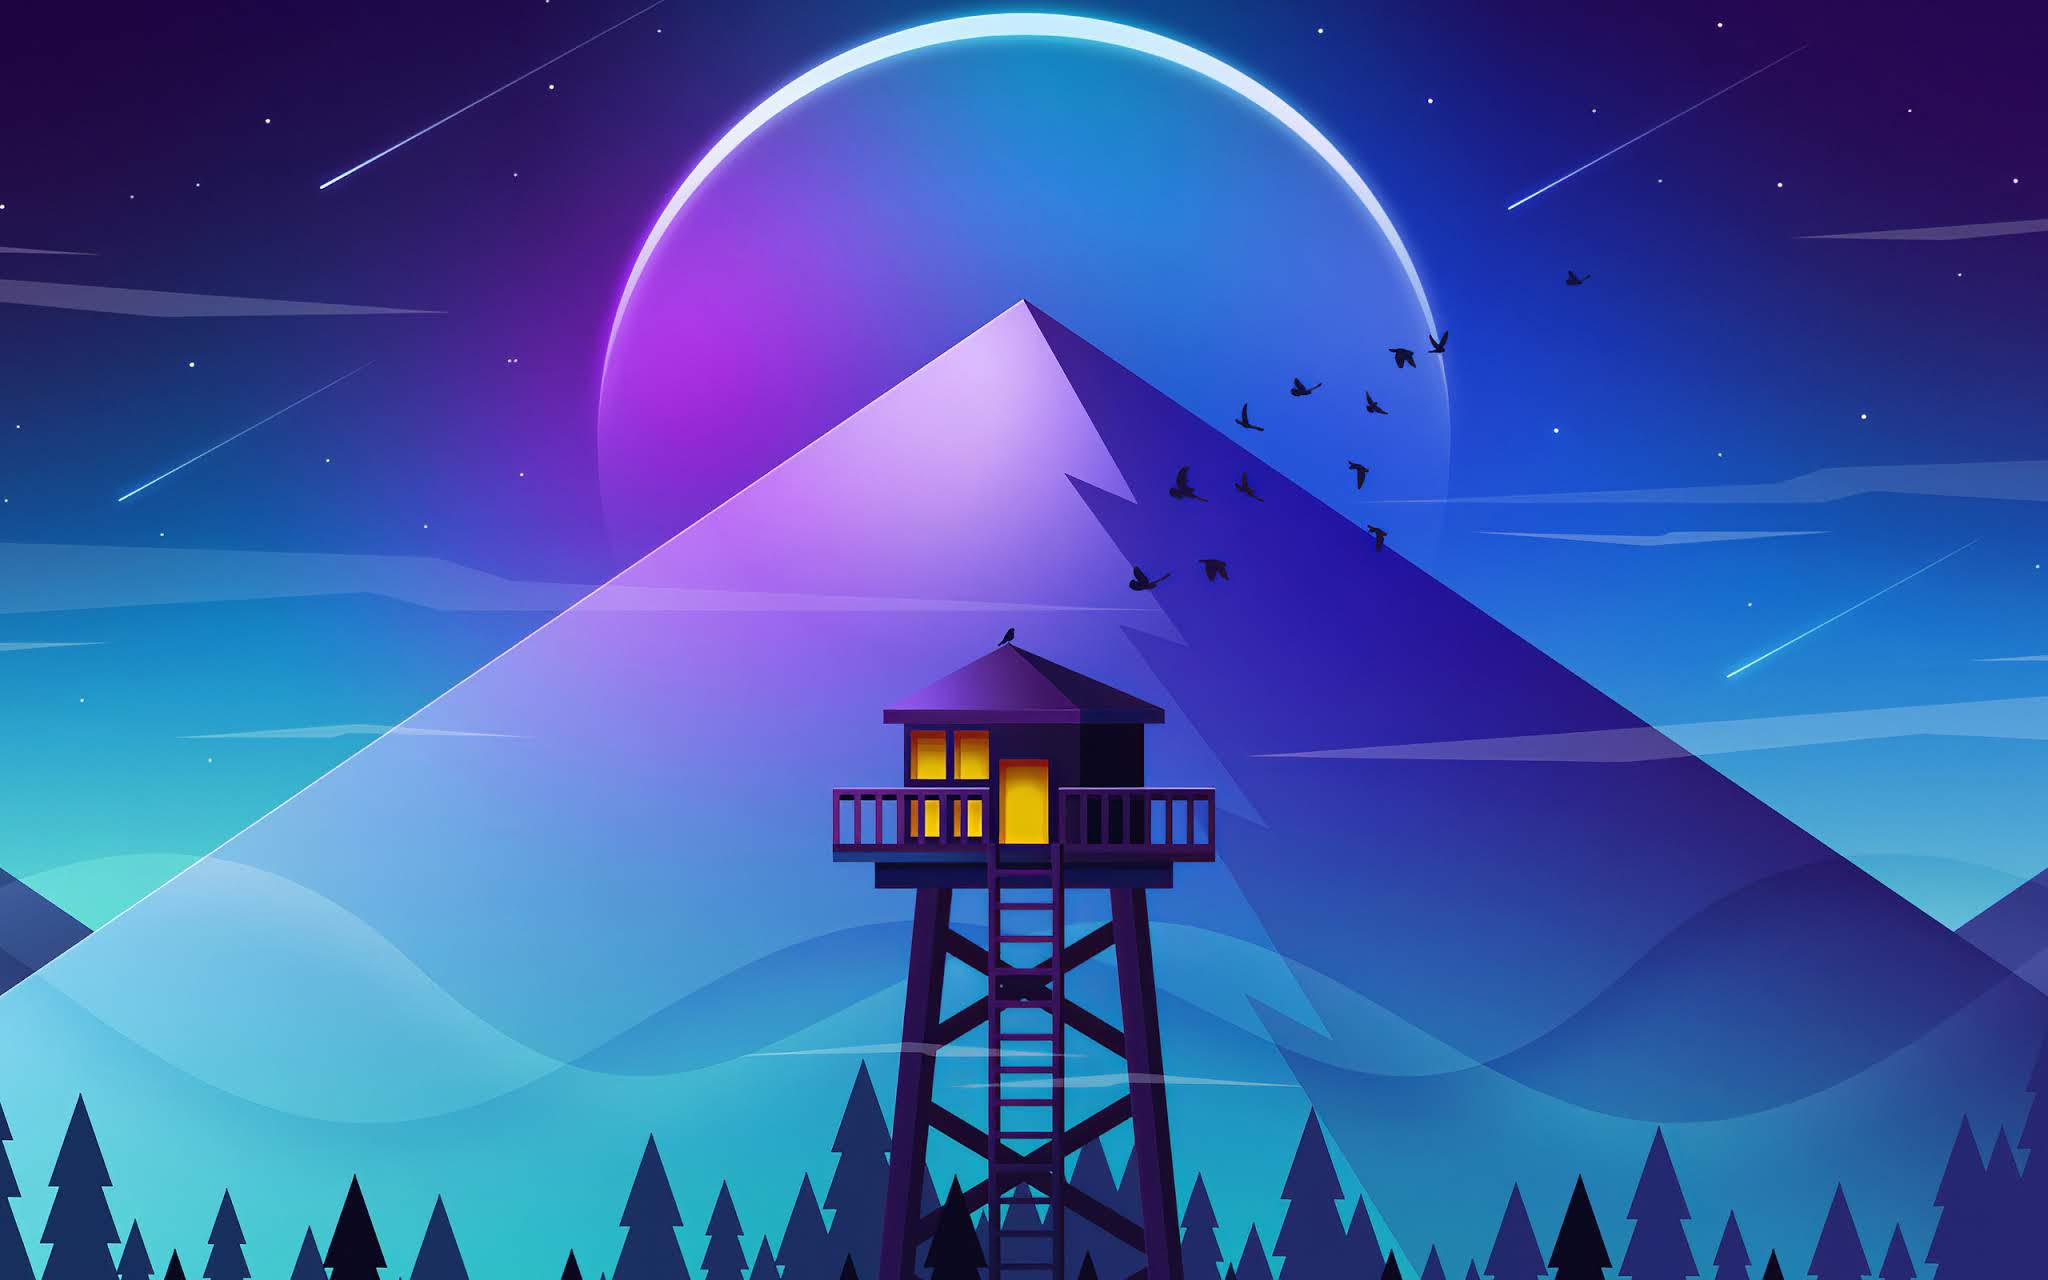 firewatch wallpaper,sky,light,illustration,architecture,graphic design